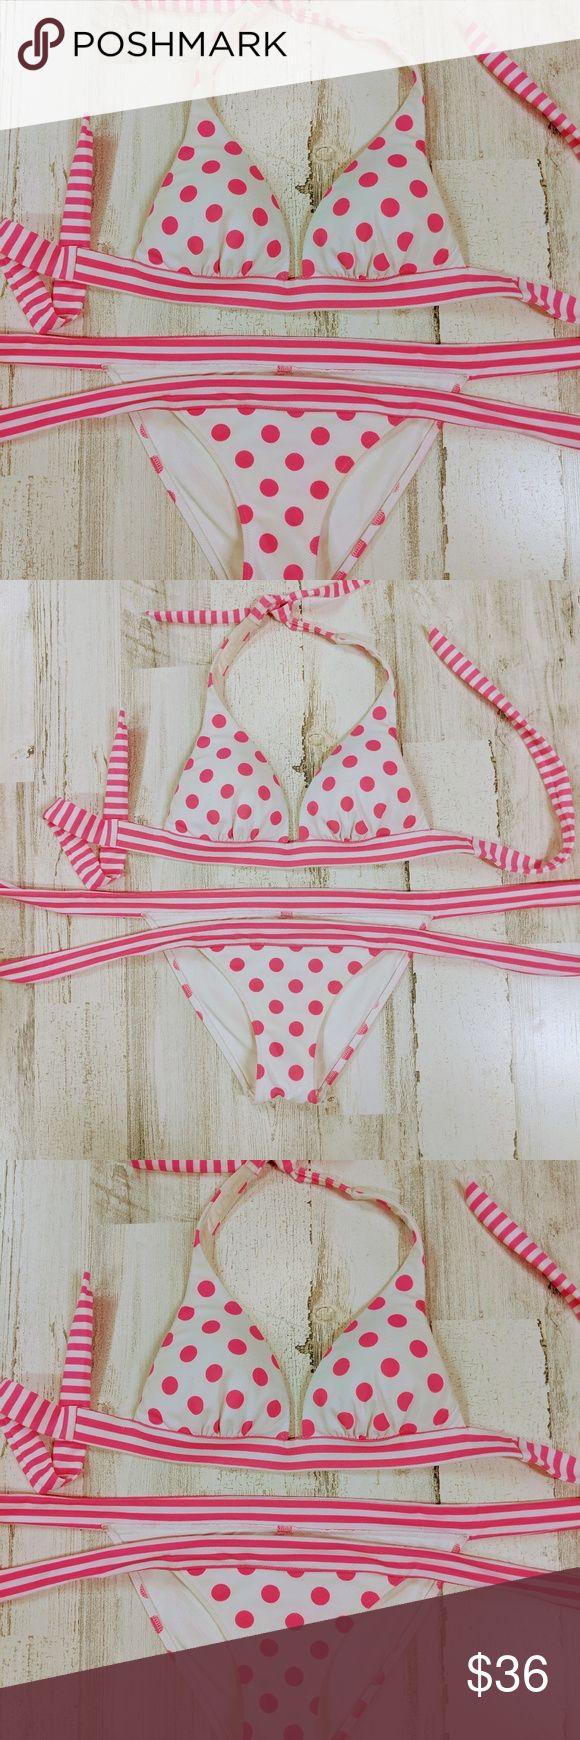 Victoria secret pink string bikini swimsuit Victoria secret pink sting bikini ex…